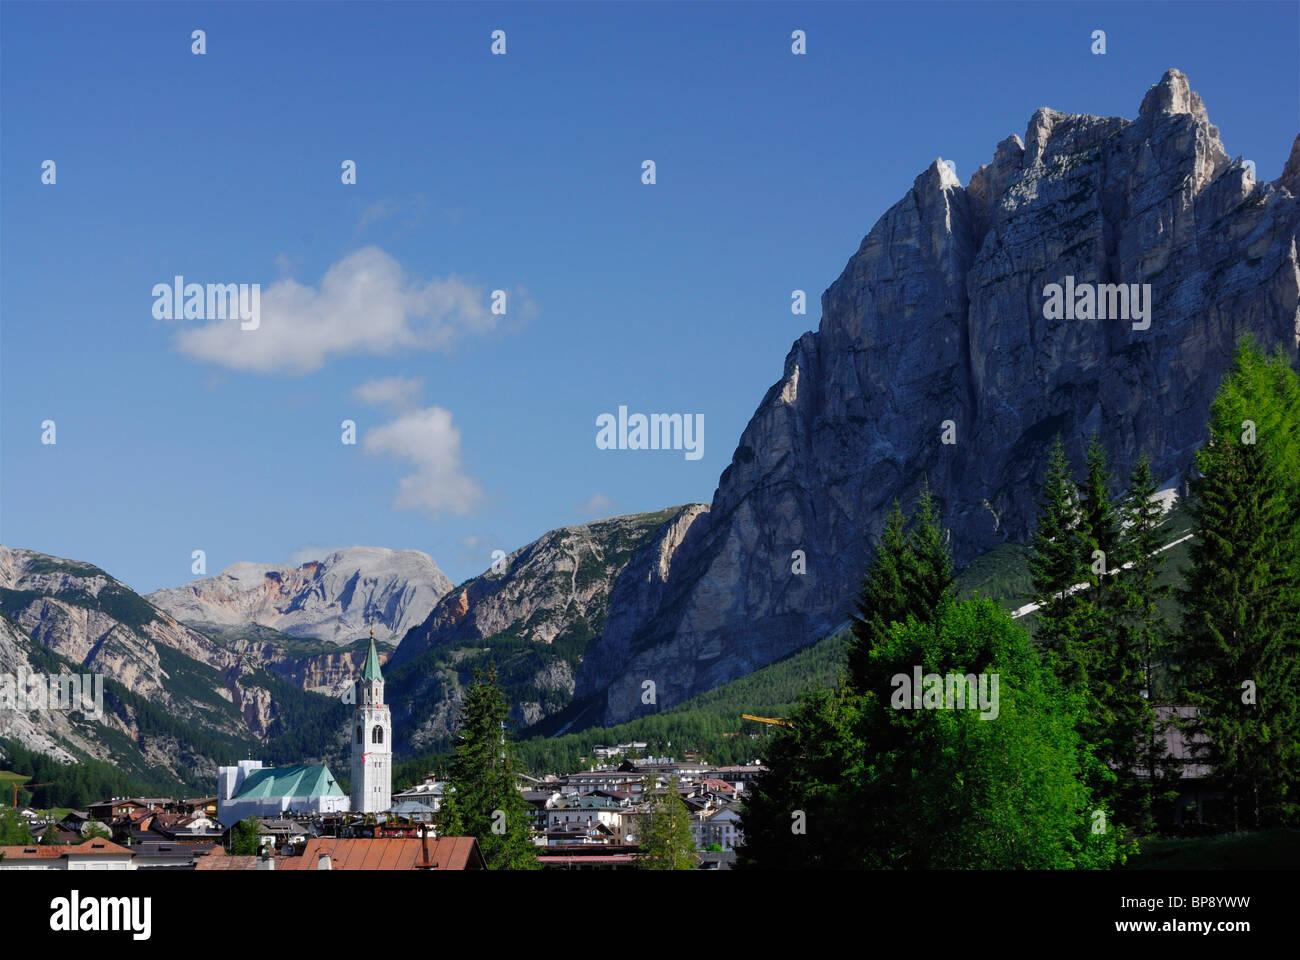 View to Cortina d' Ampezzo with Punta Fiames, Dolomites, Veneto, Italy - Stock Image